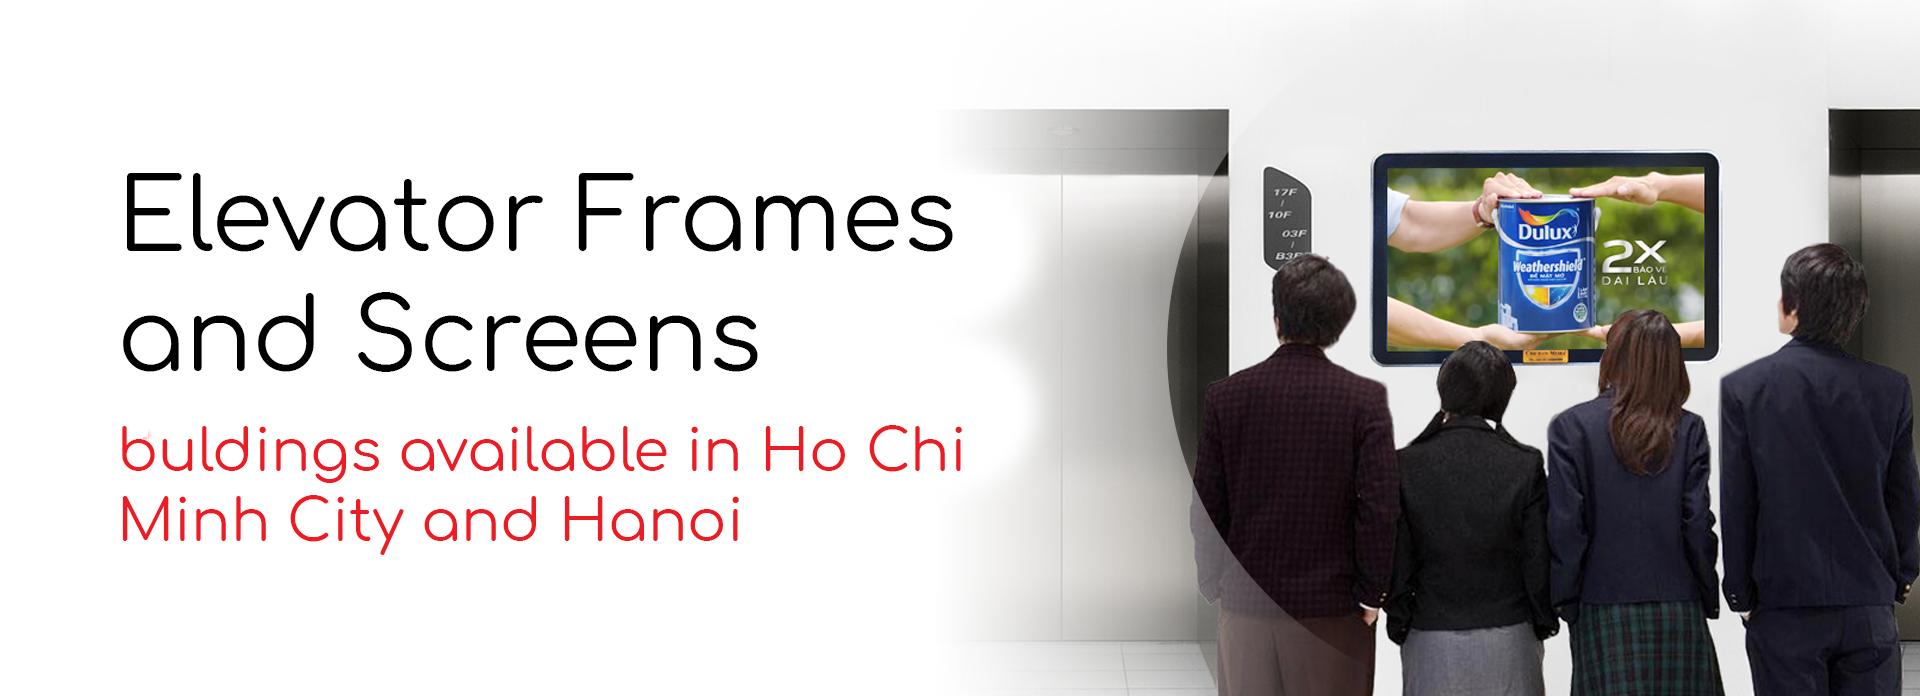 frame thang may english